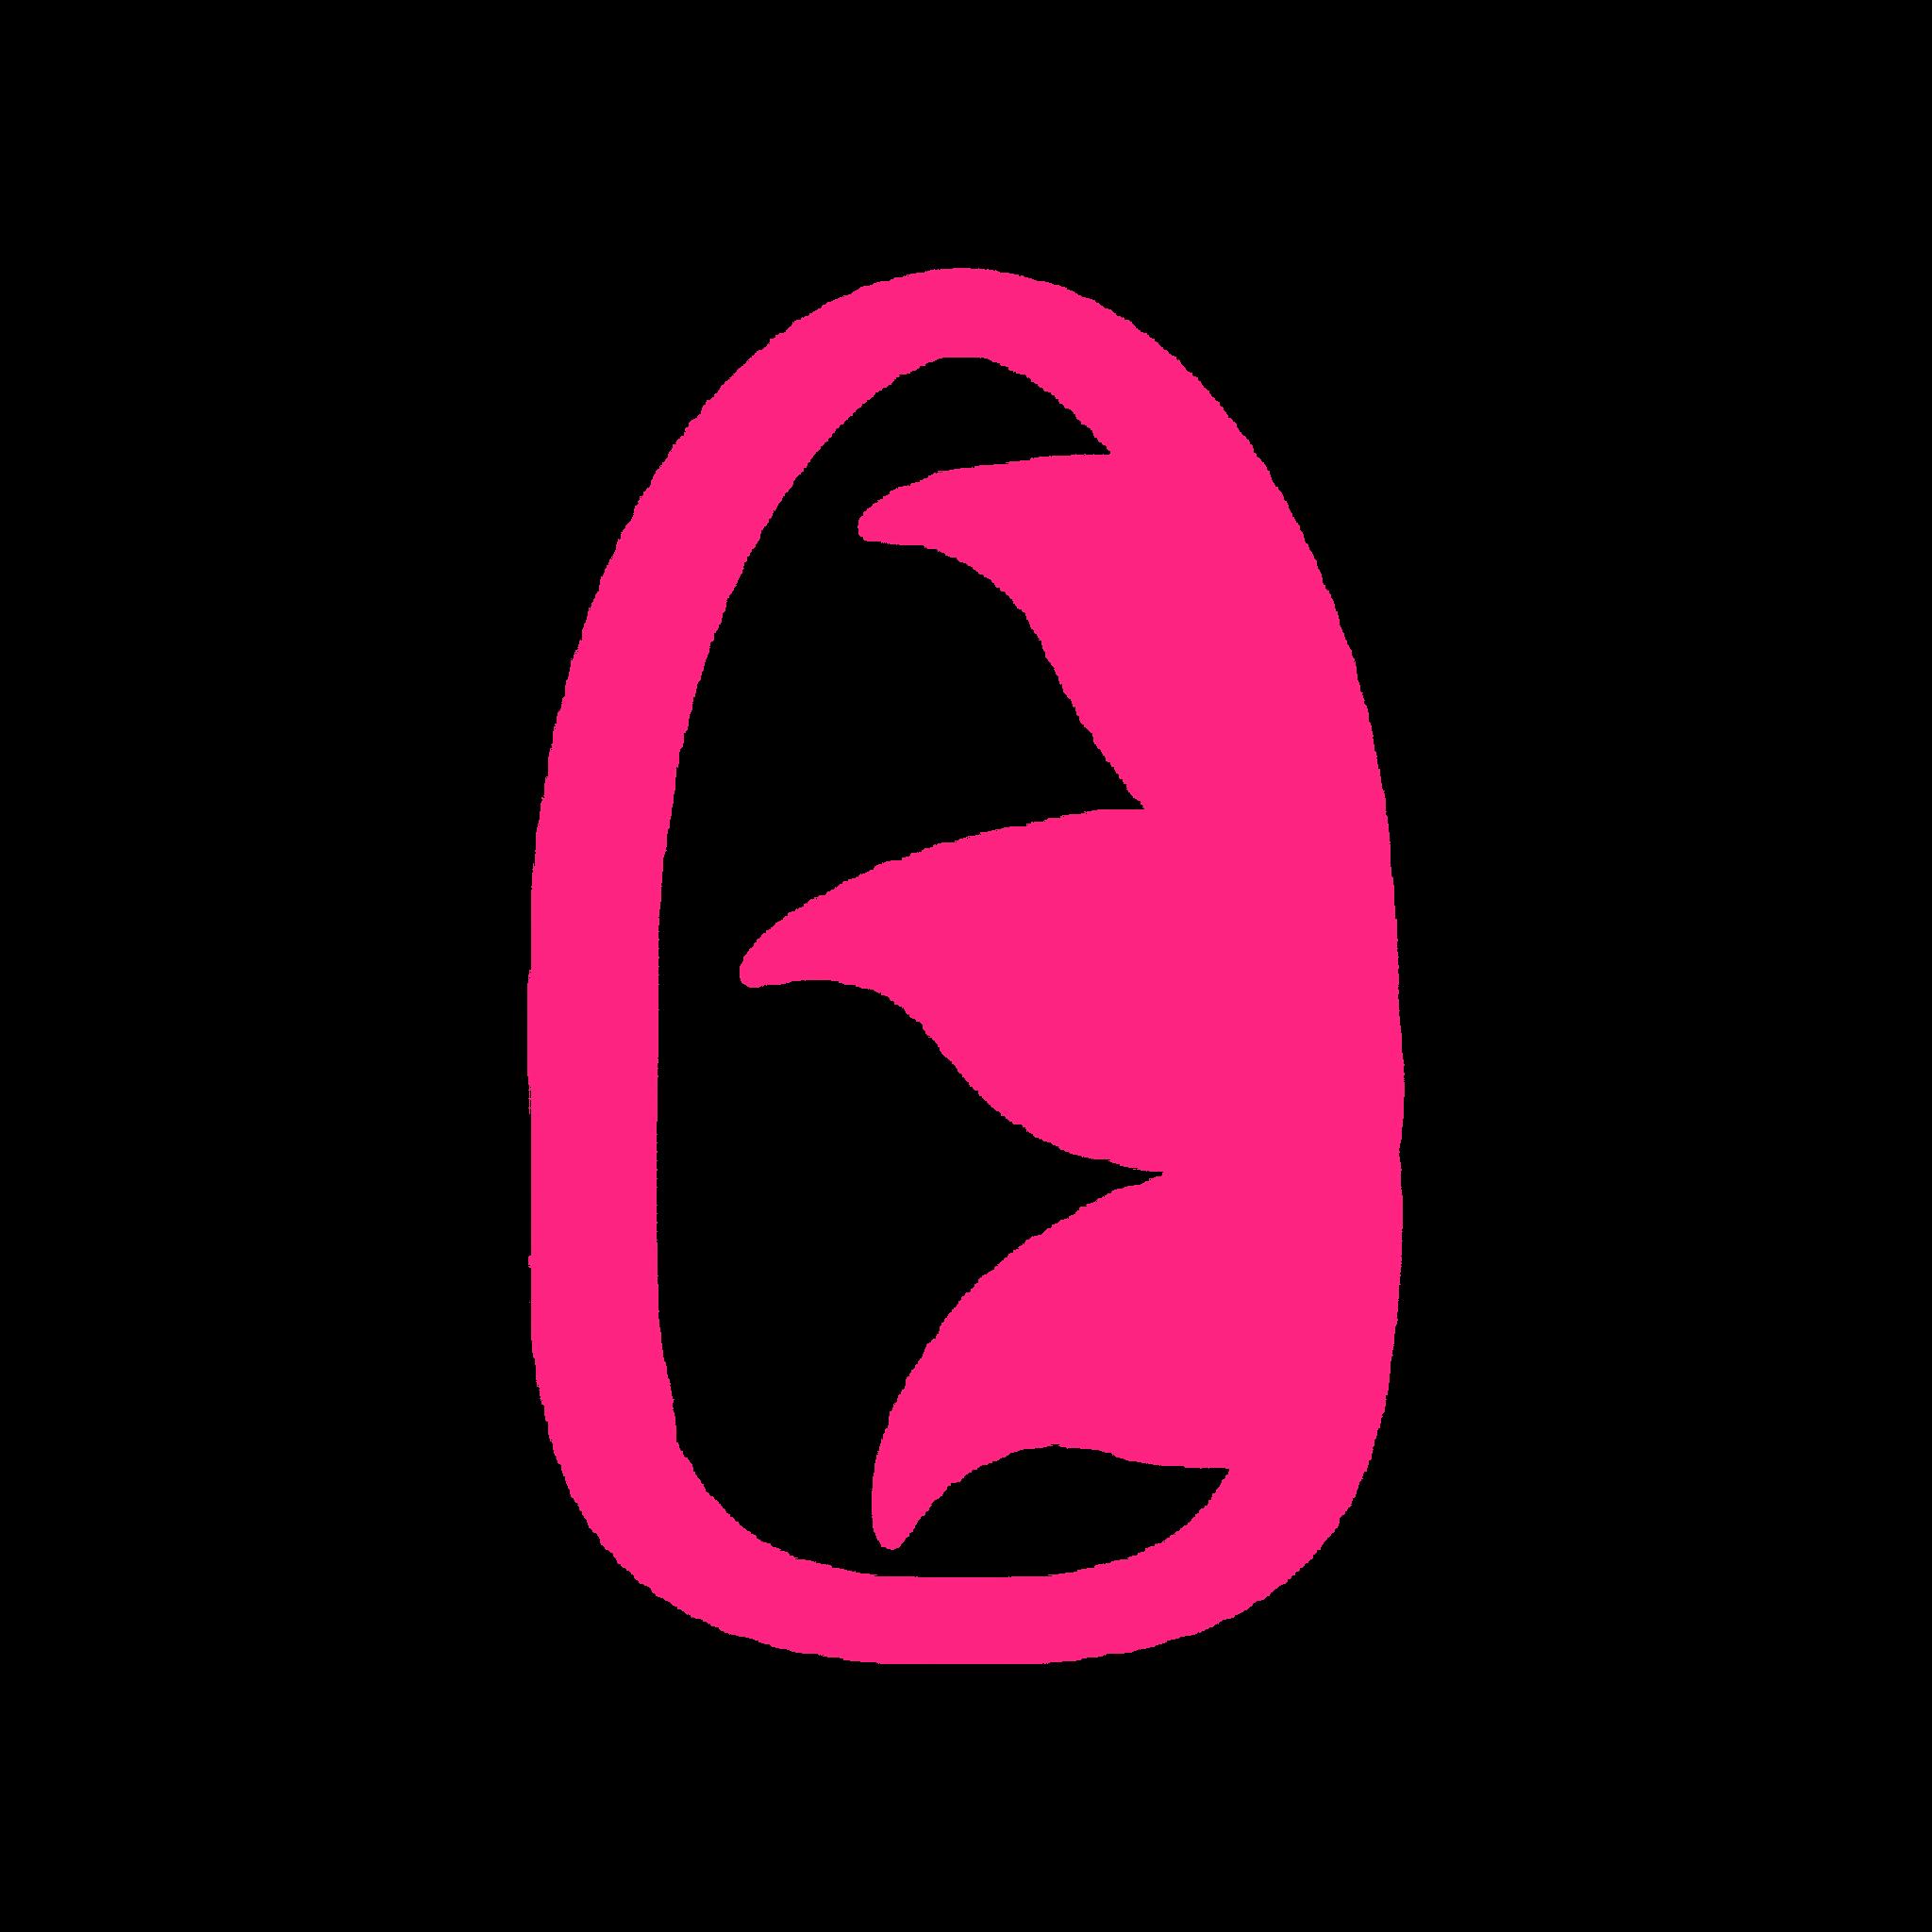 #KD Nail Emblem